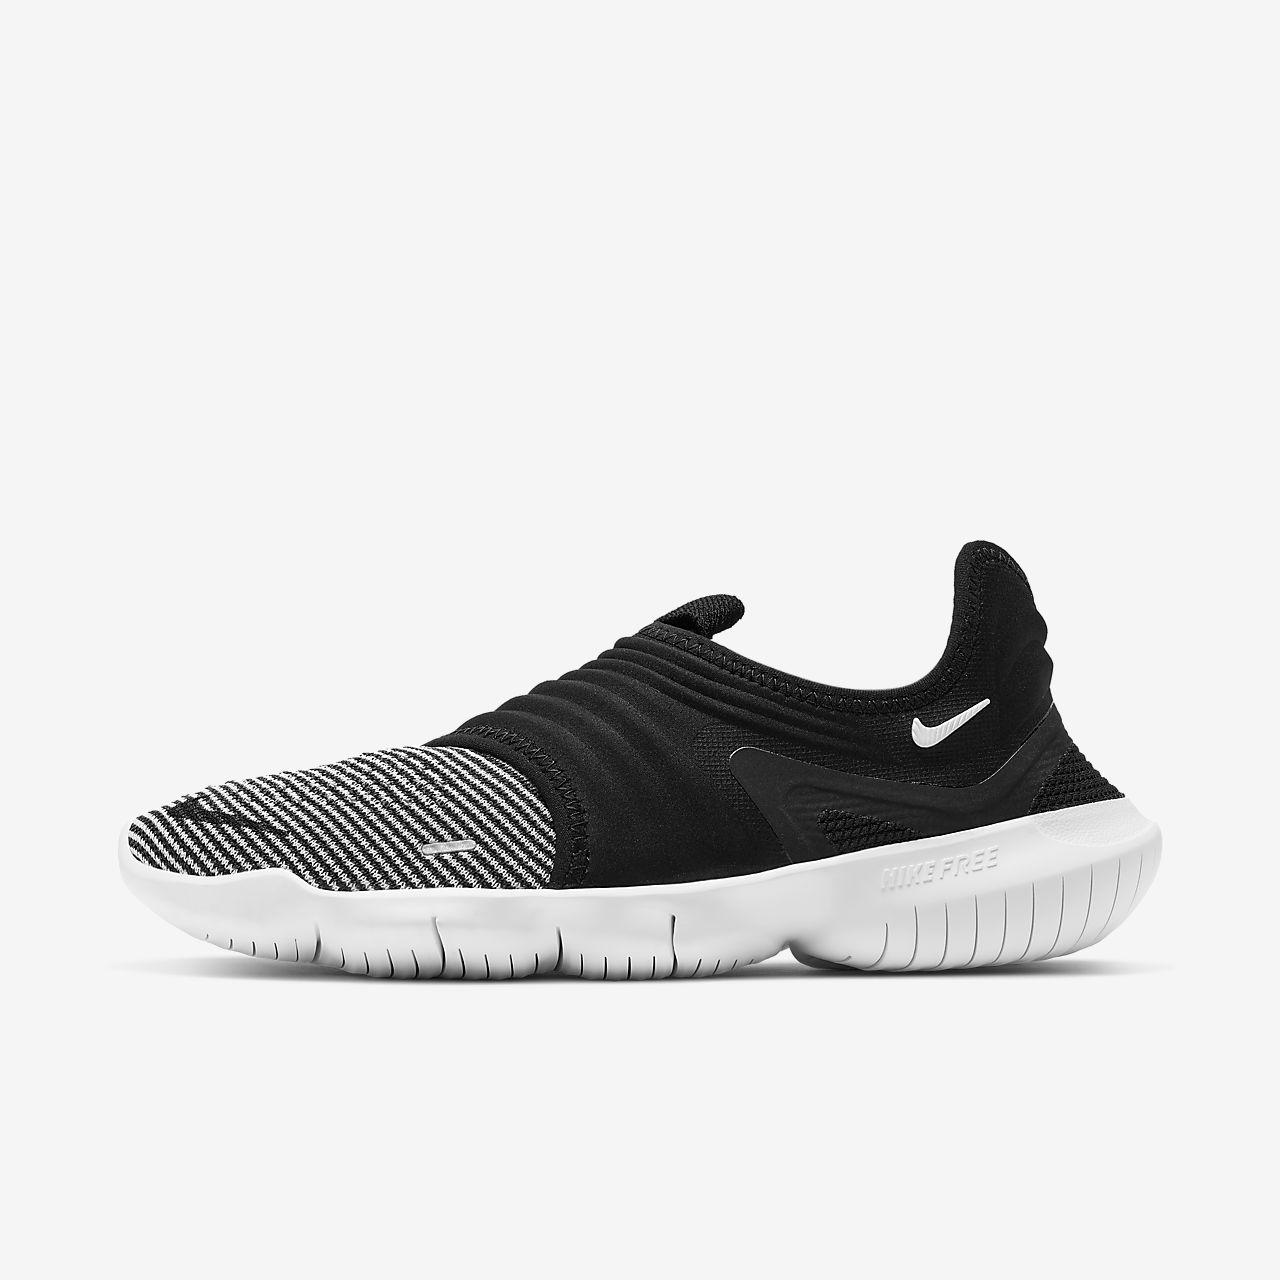 Calzado de running para mujer Nike Free RN Flyknit 3.0